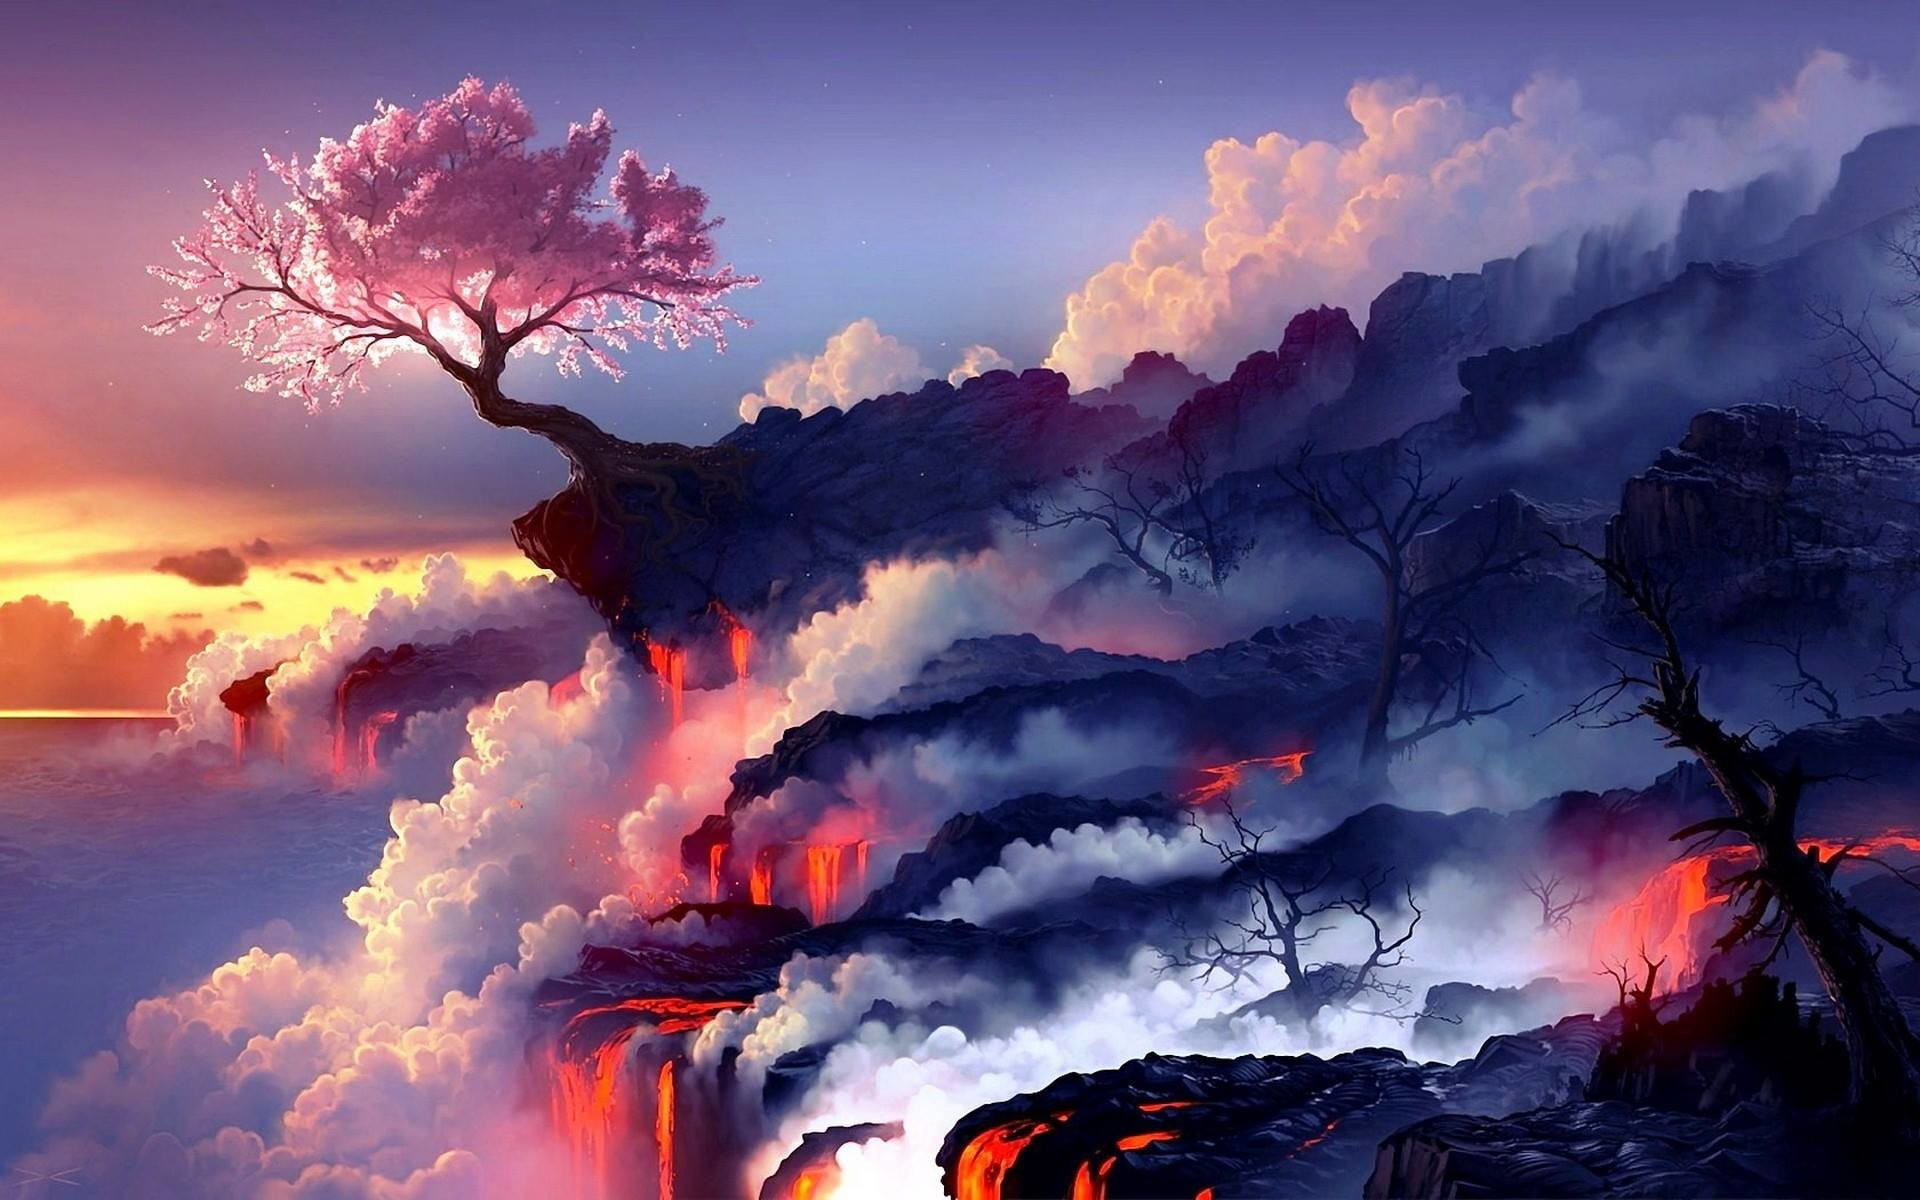 Cherry tree on the volcano Artistic HD desktop wallpaper, Tree wallpaper, Cherry  wallpaper, Lava wallpaper, Volcano wallpaper – Artistic no.